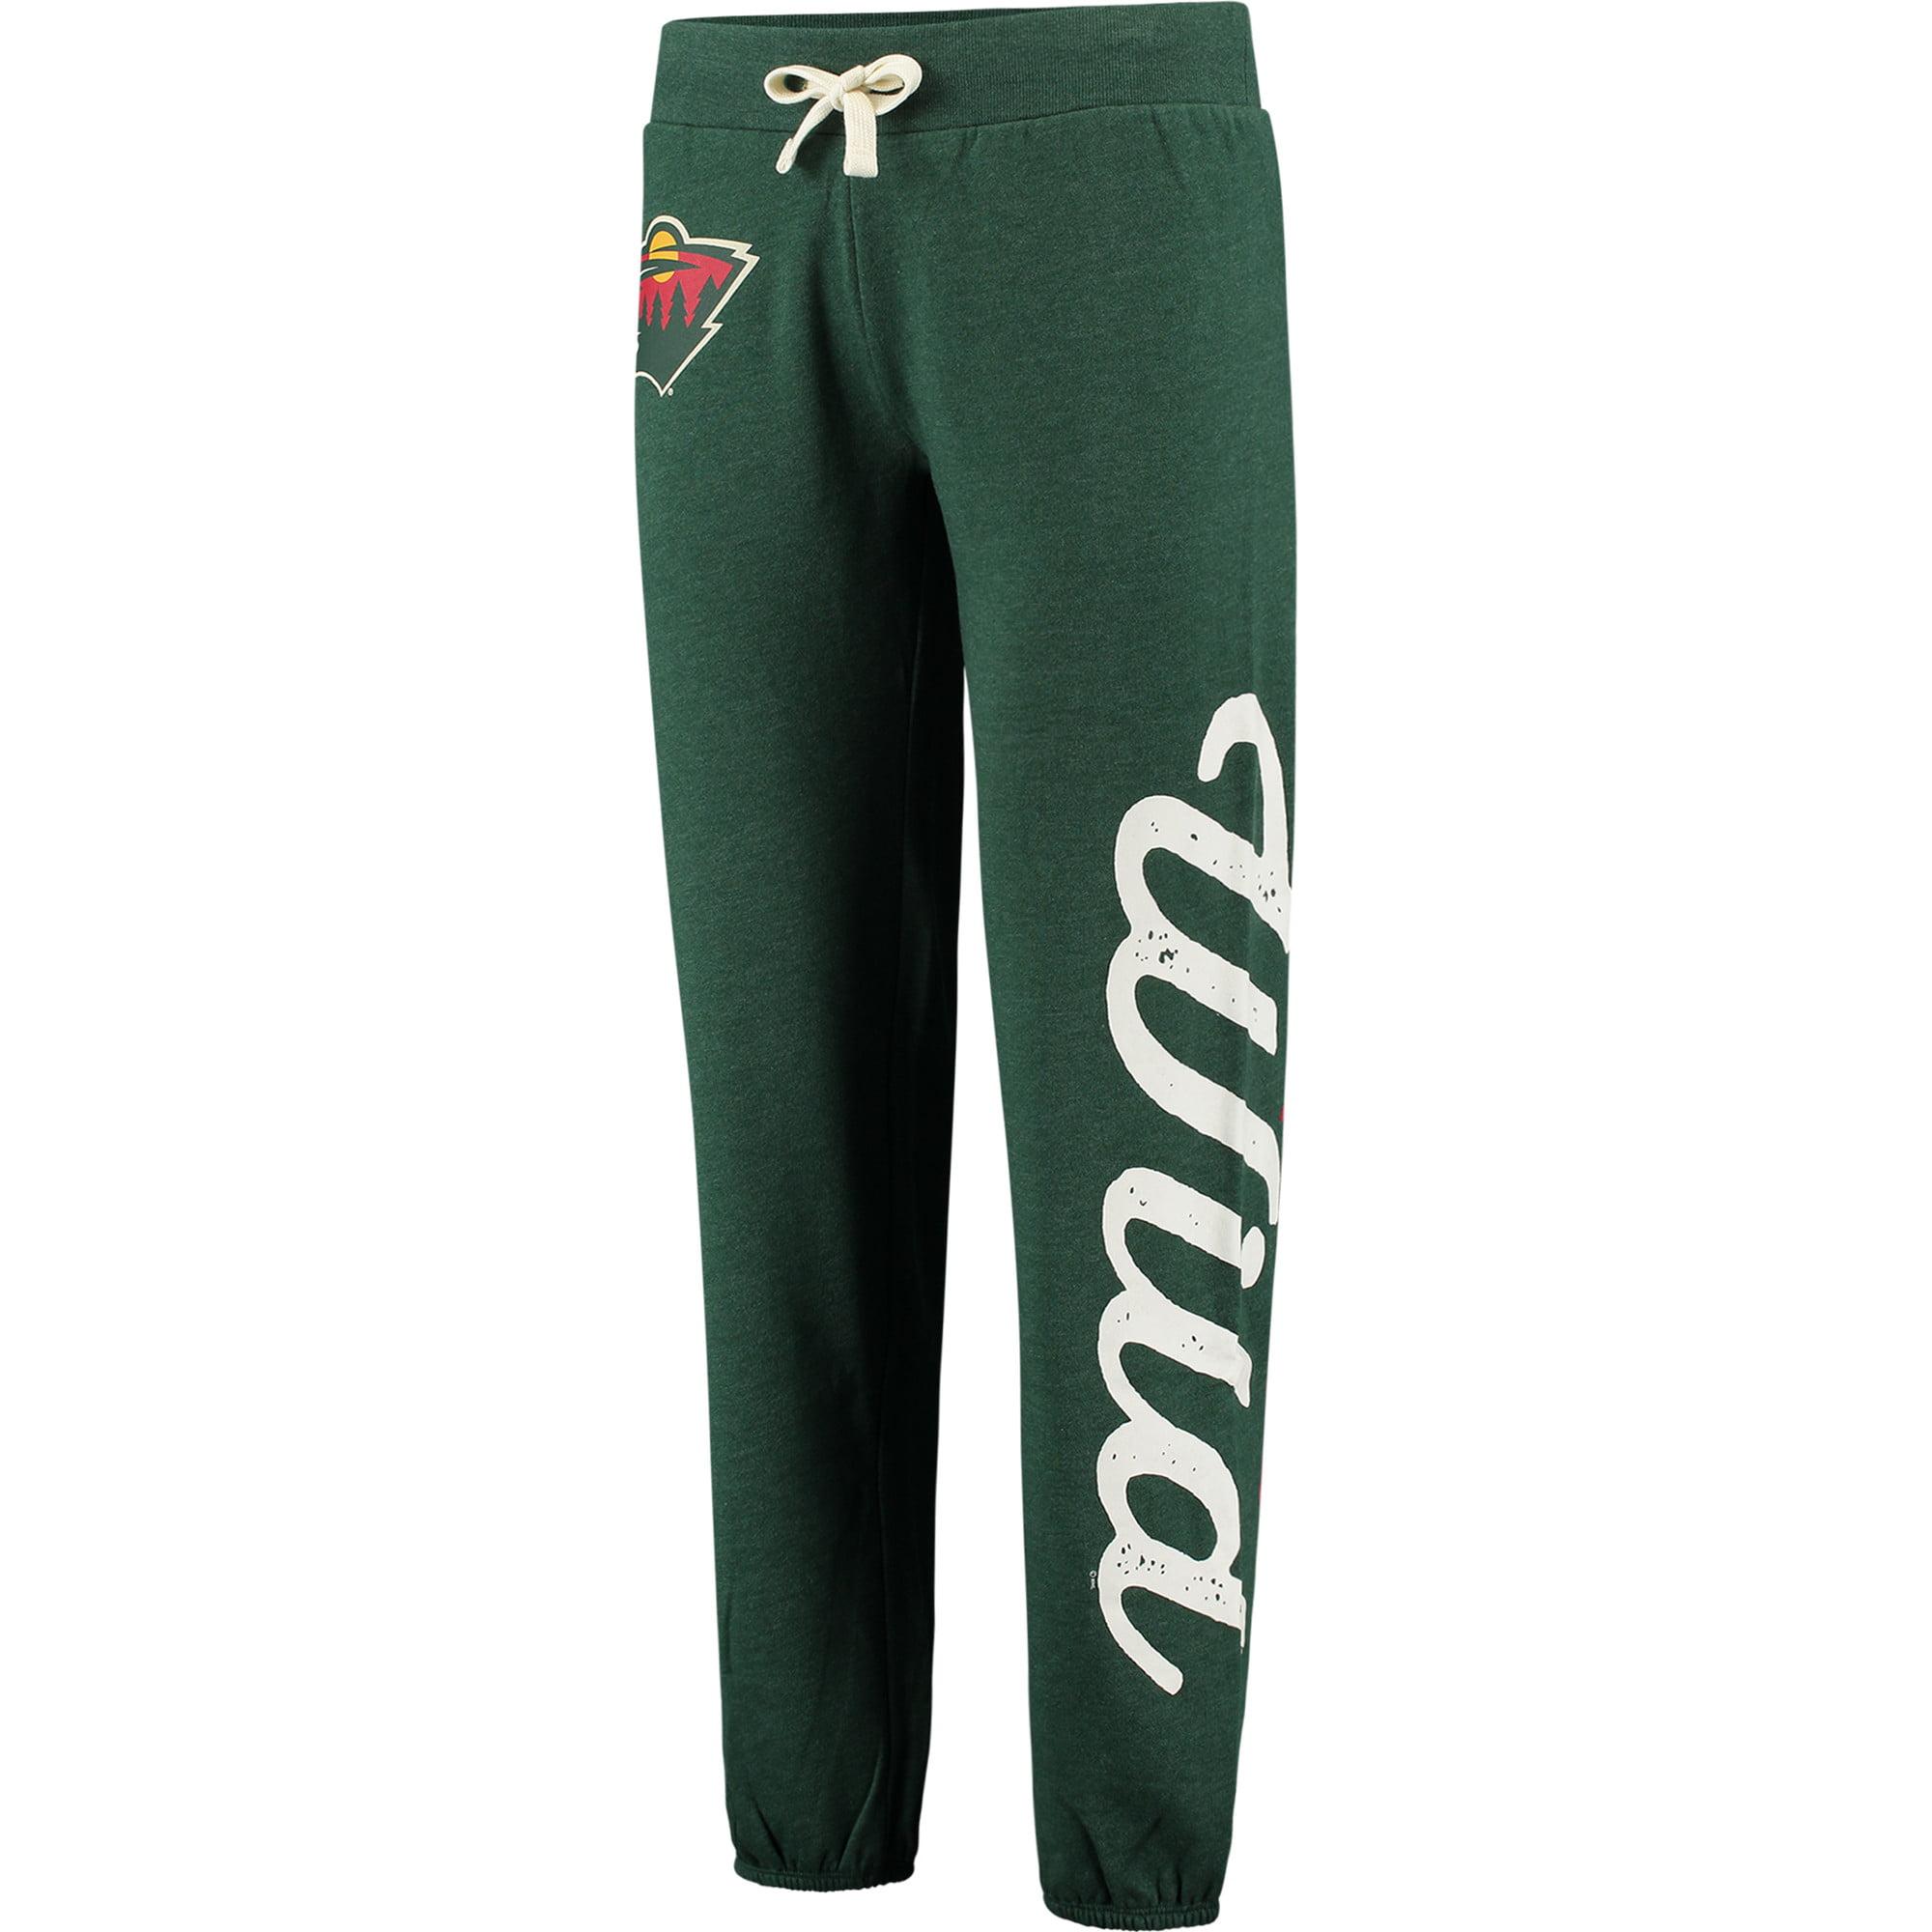 Minnesota Wild G-III 4Her by Carl Banks Women's Scrimmage Pants - Green